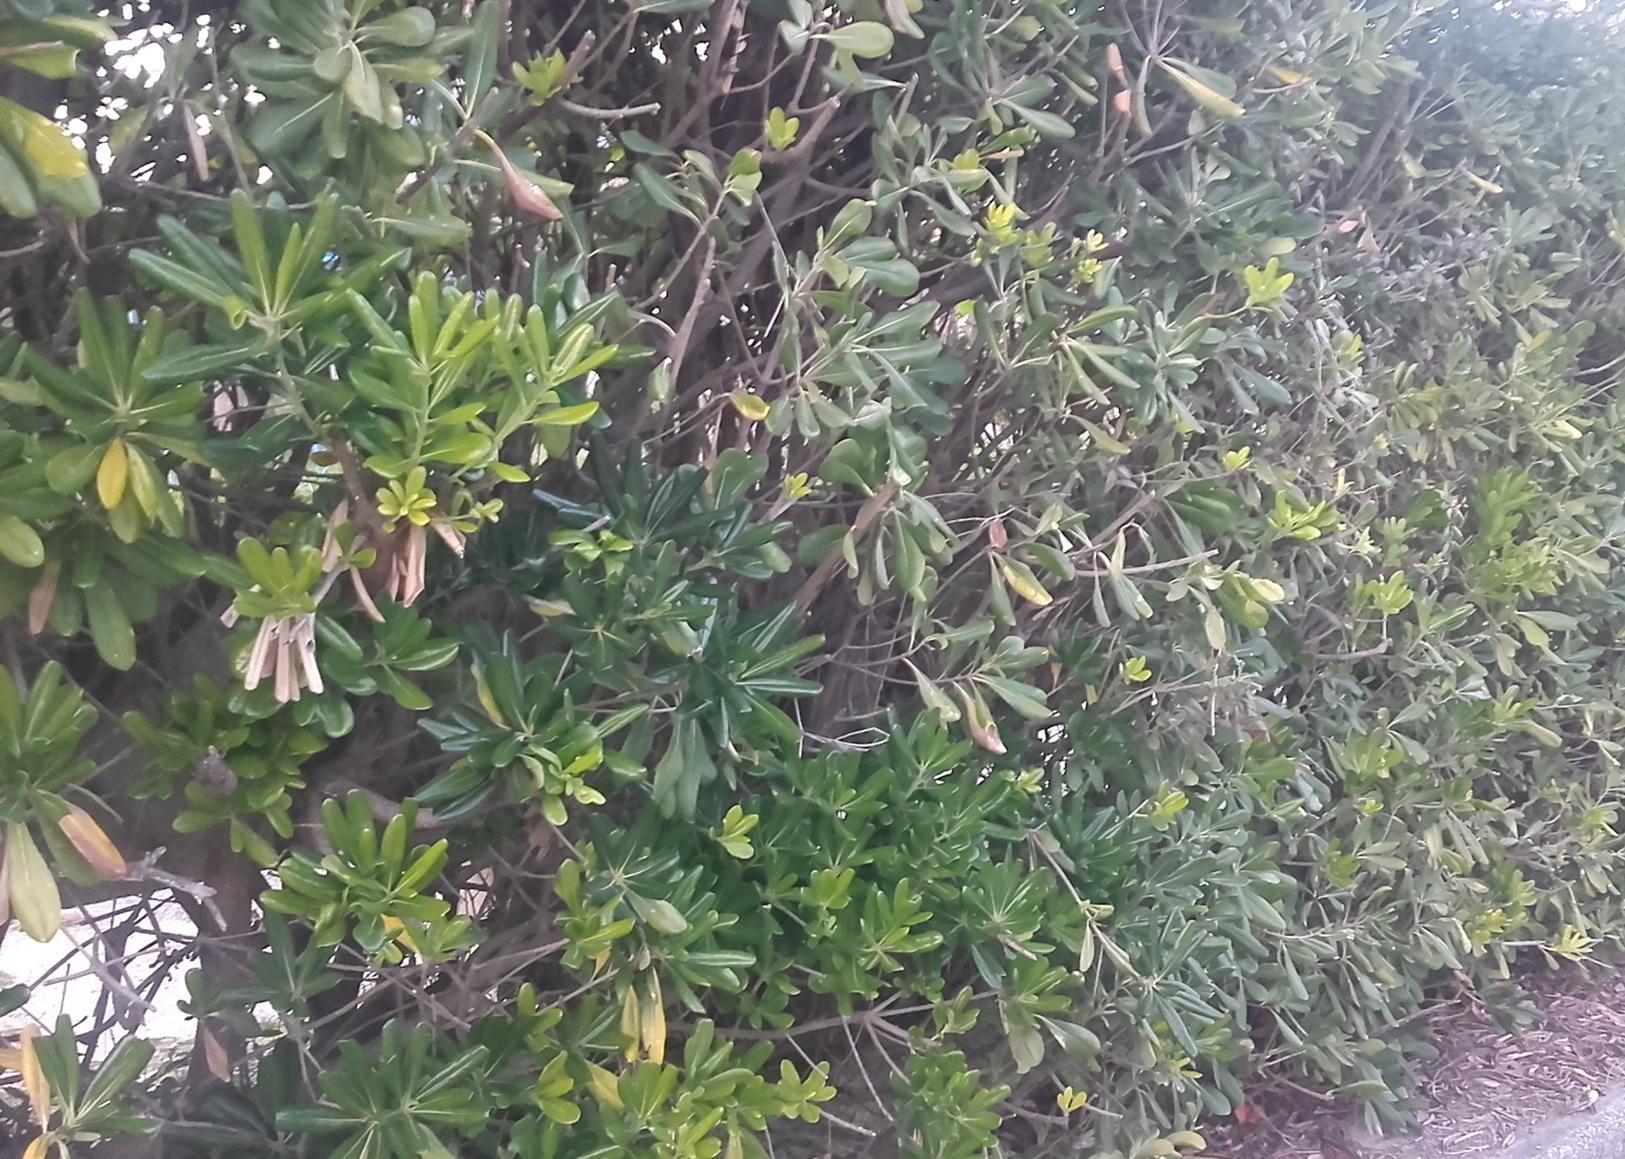 Pitosforo pianta marina for Pitosforo siepe